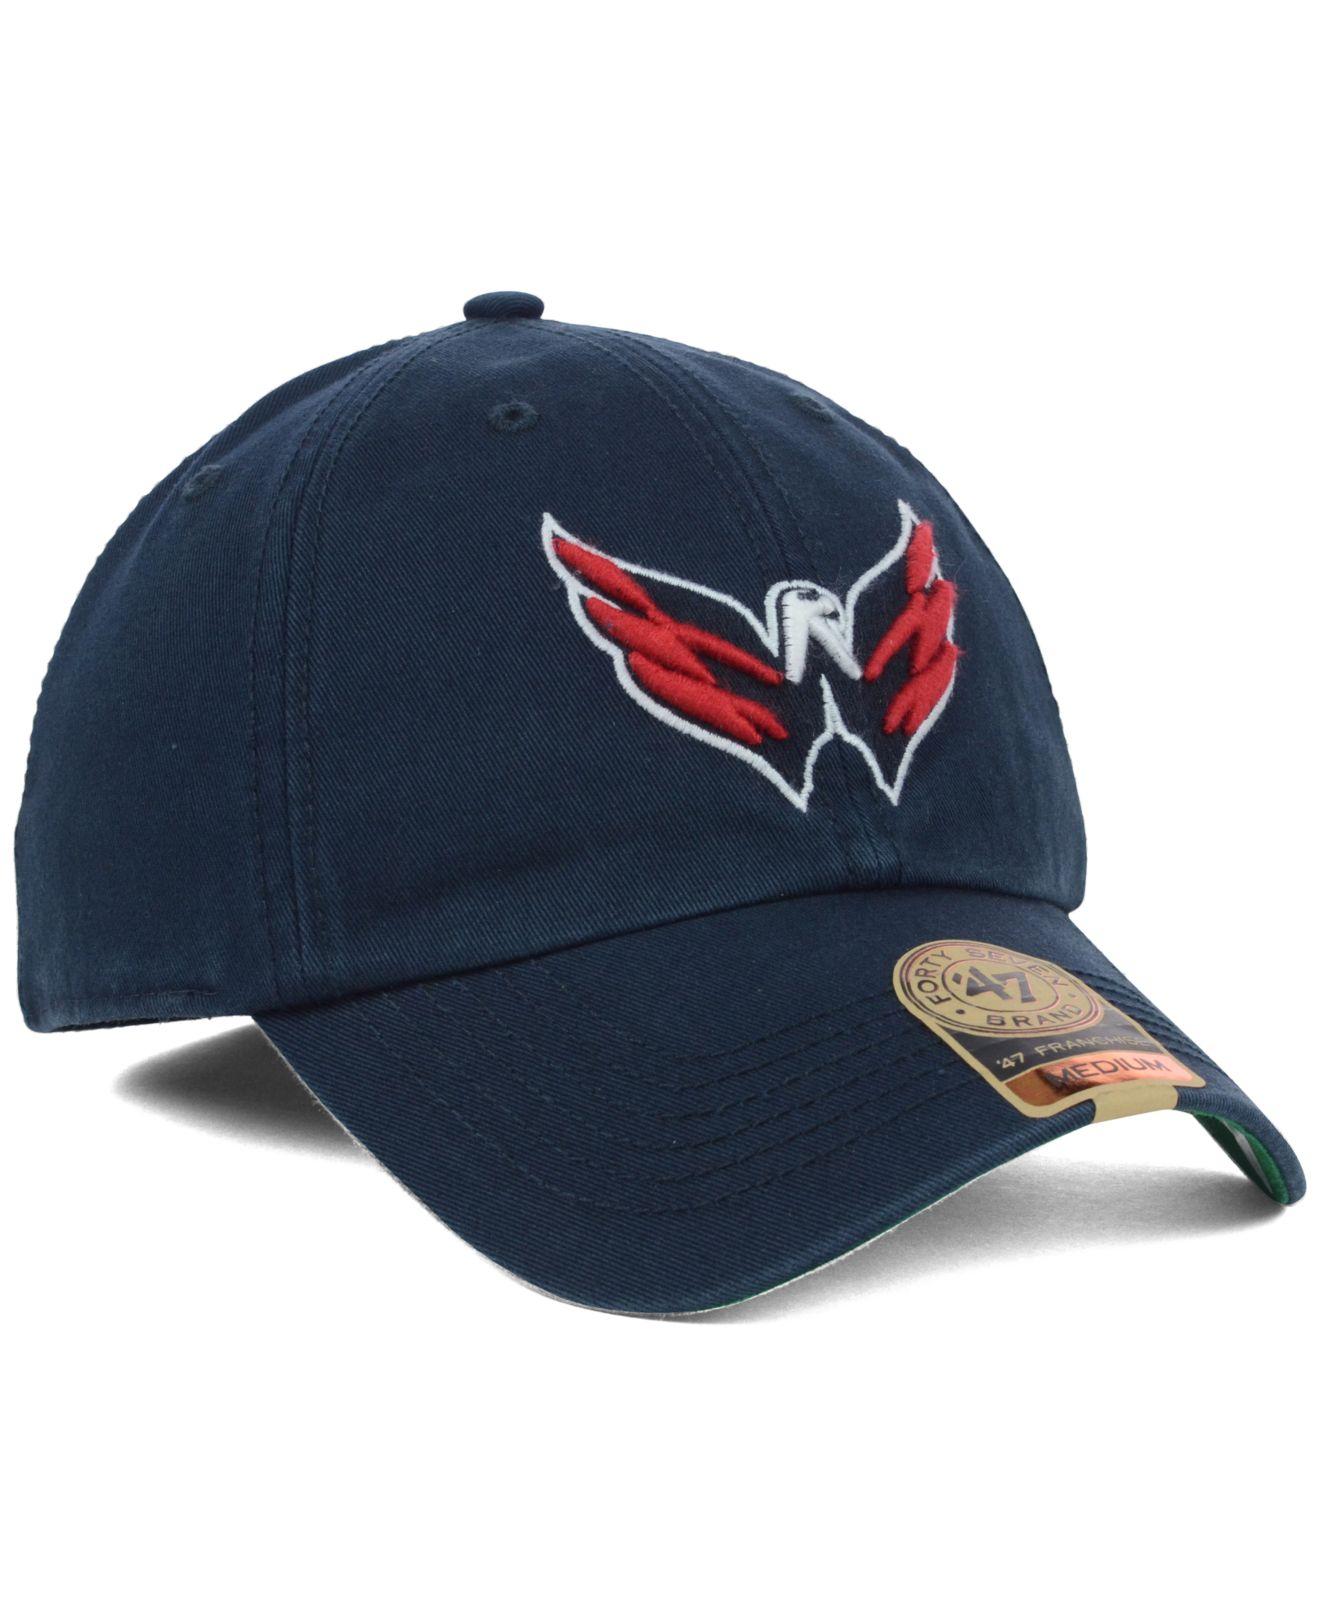 Lyst - 47 Brand Washington Capitals Franchise Cap in Blue for Men c904000fe85a